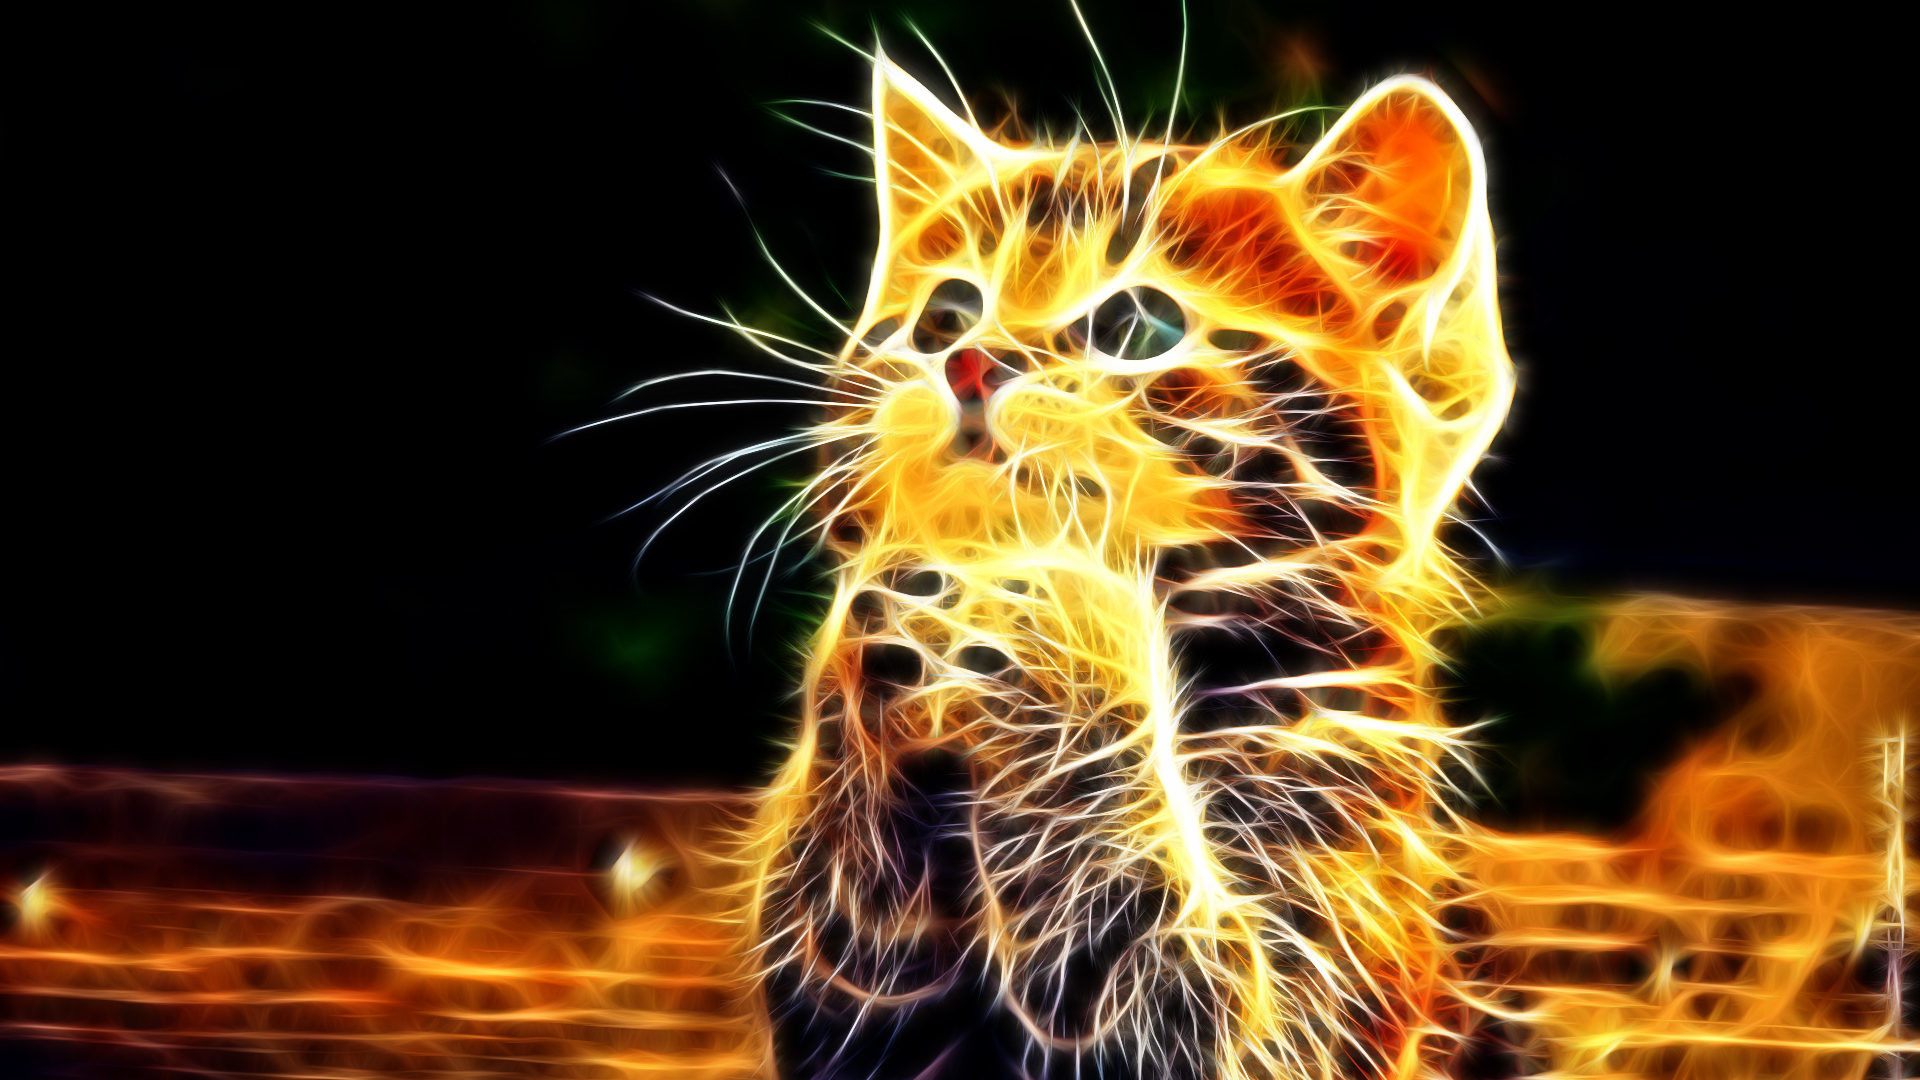 cat desktop wallpaper hd https://www.4gwallpapers.com/wp-